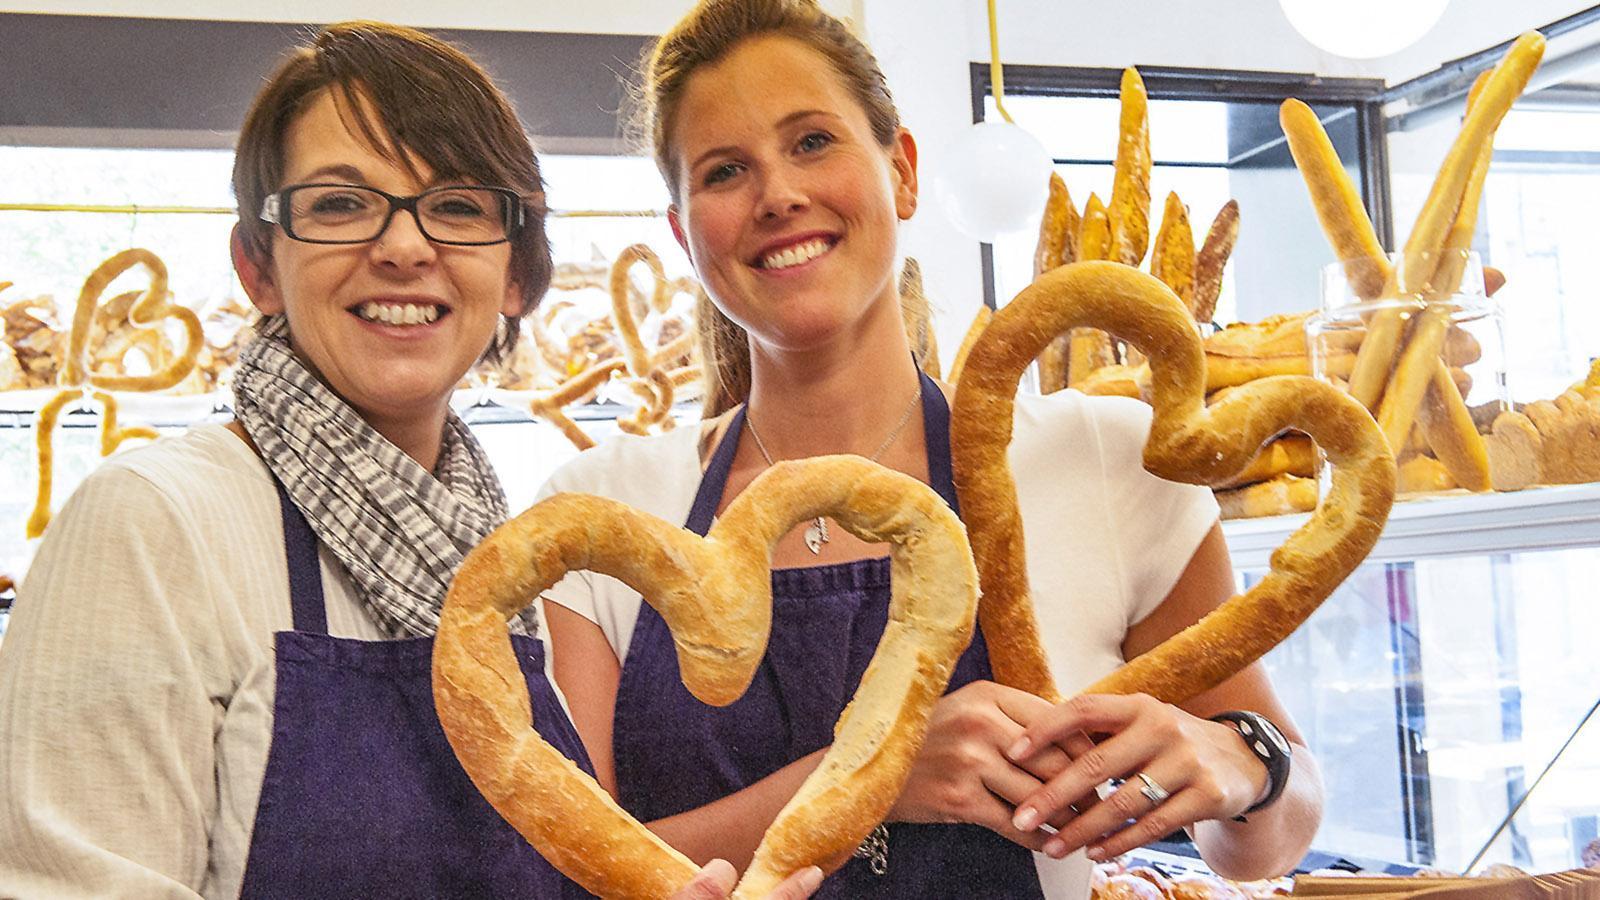 Großes Herz: Bäckerinnen in Avignon. Foto: Hilke Maunder